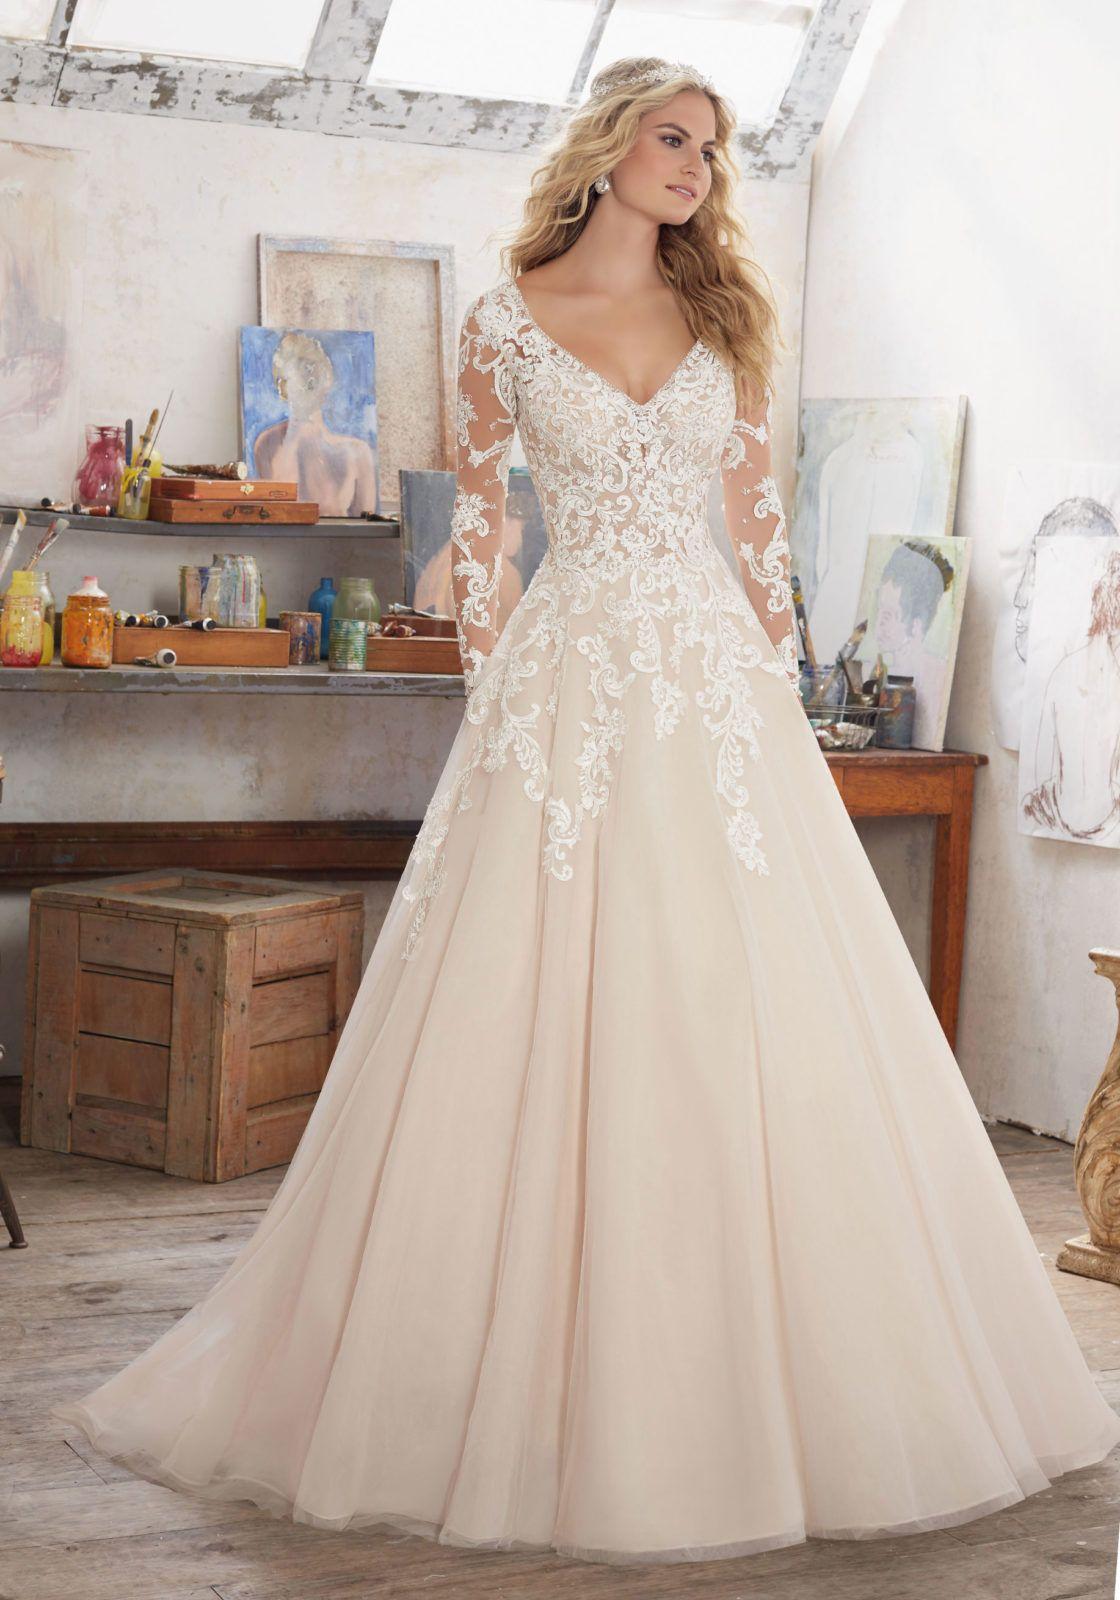 Maria Wedding Dress Morilee Mori Lee Wedding Dress Wedding Dresses Size 14 Bridal Dresses